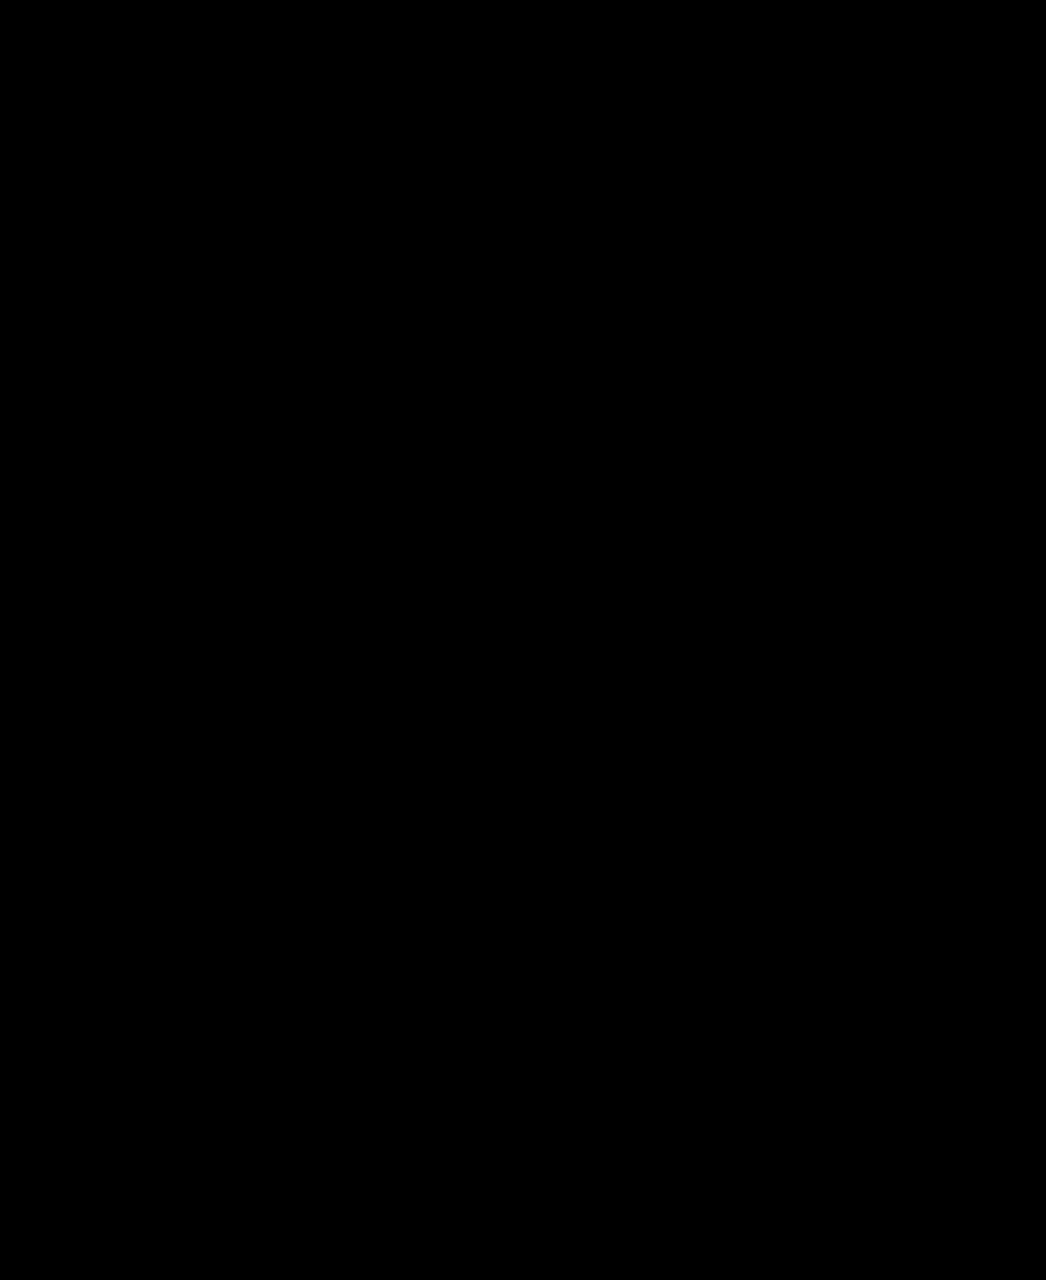 Diamond Ring SVG Cut File